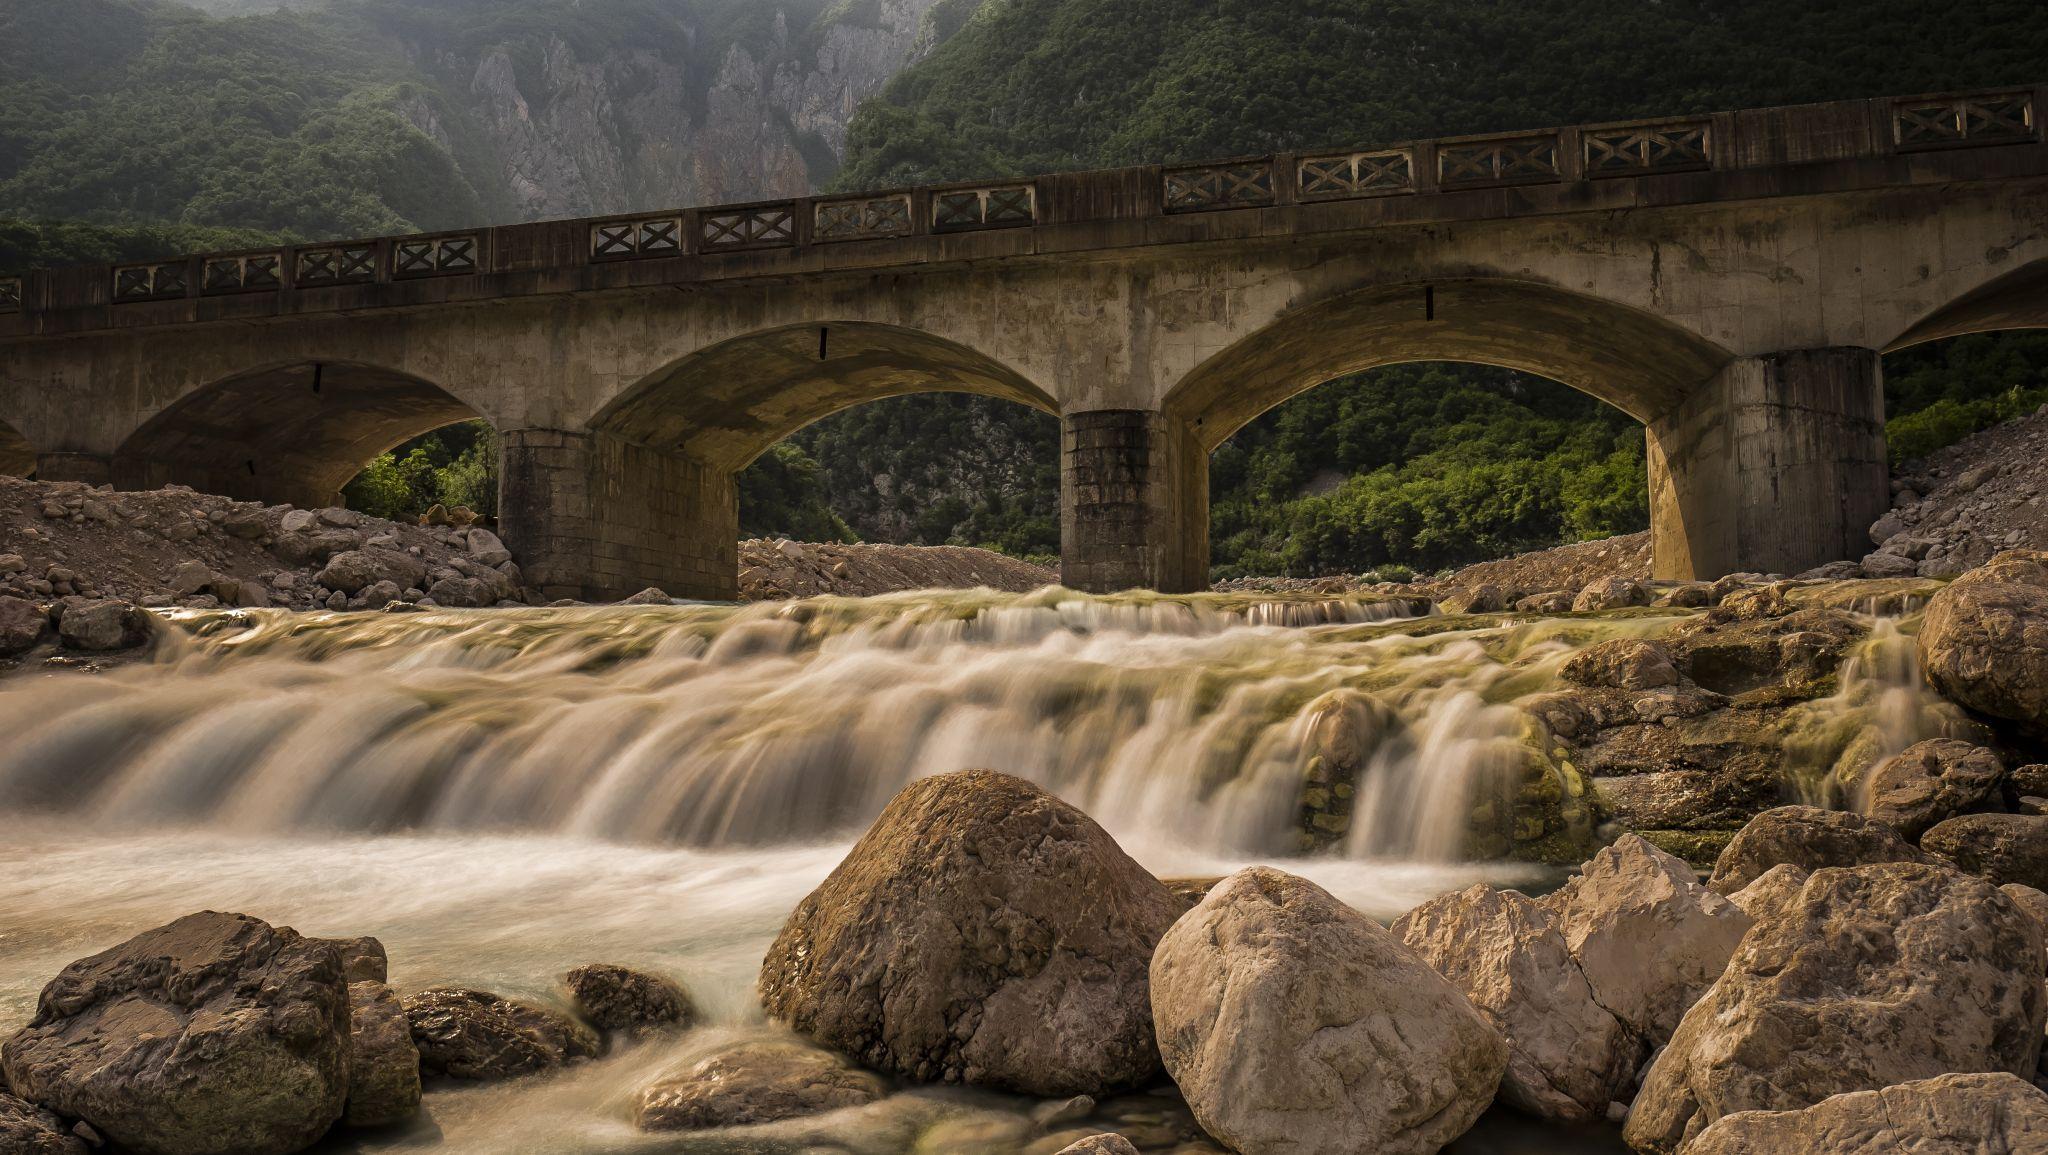 Bridge over Boka, Slovenia